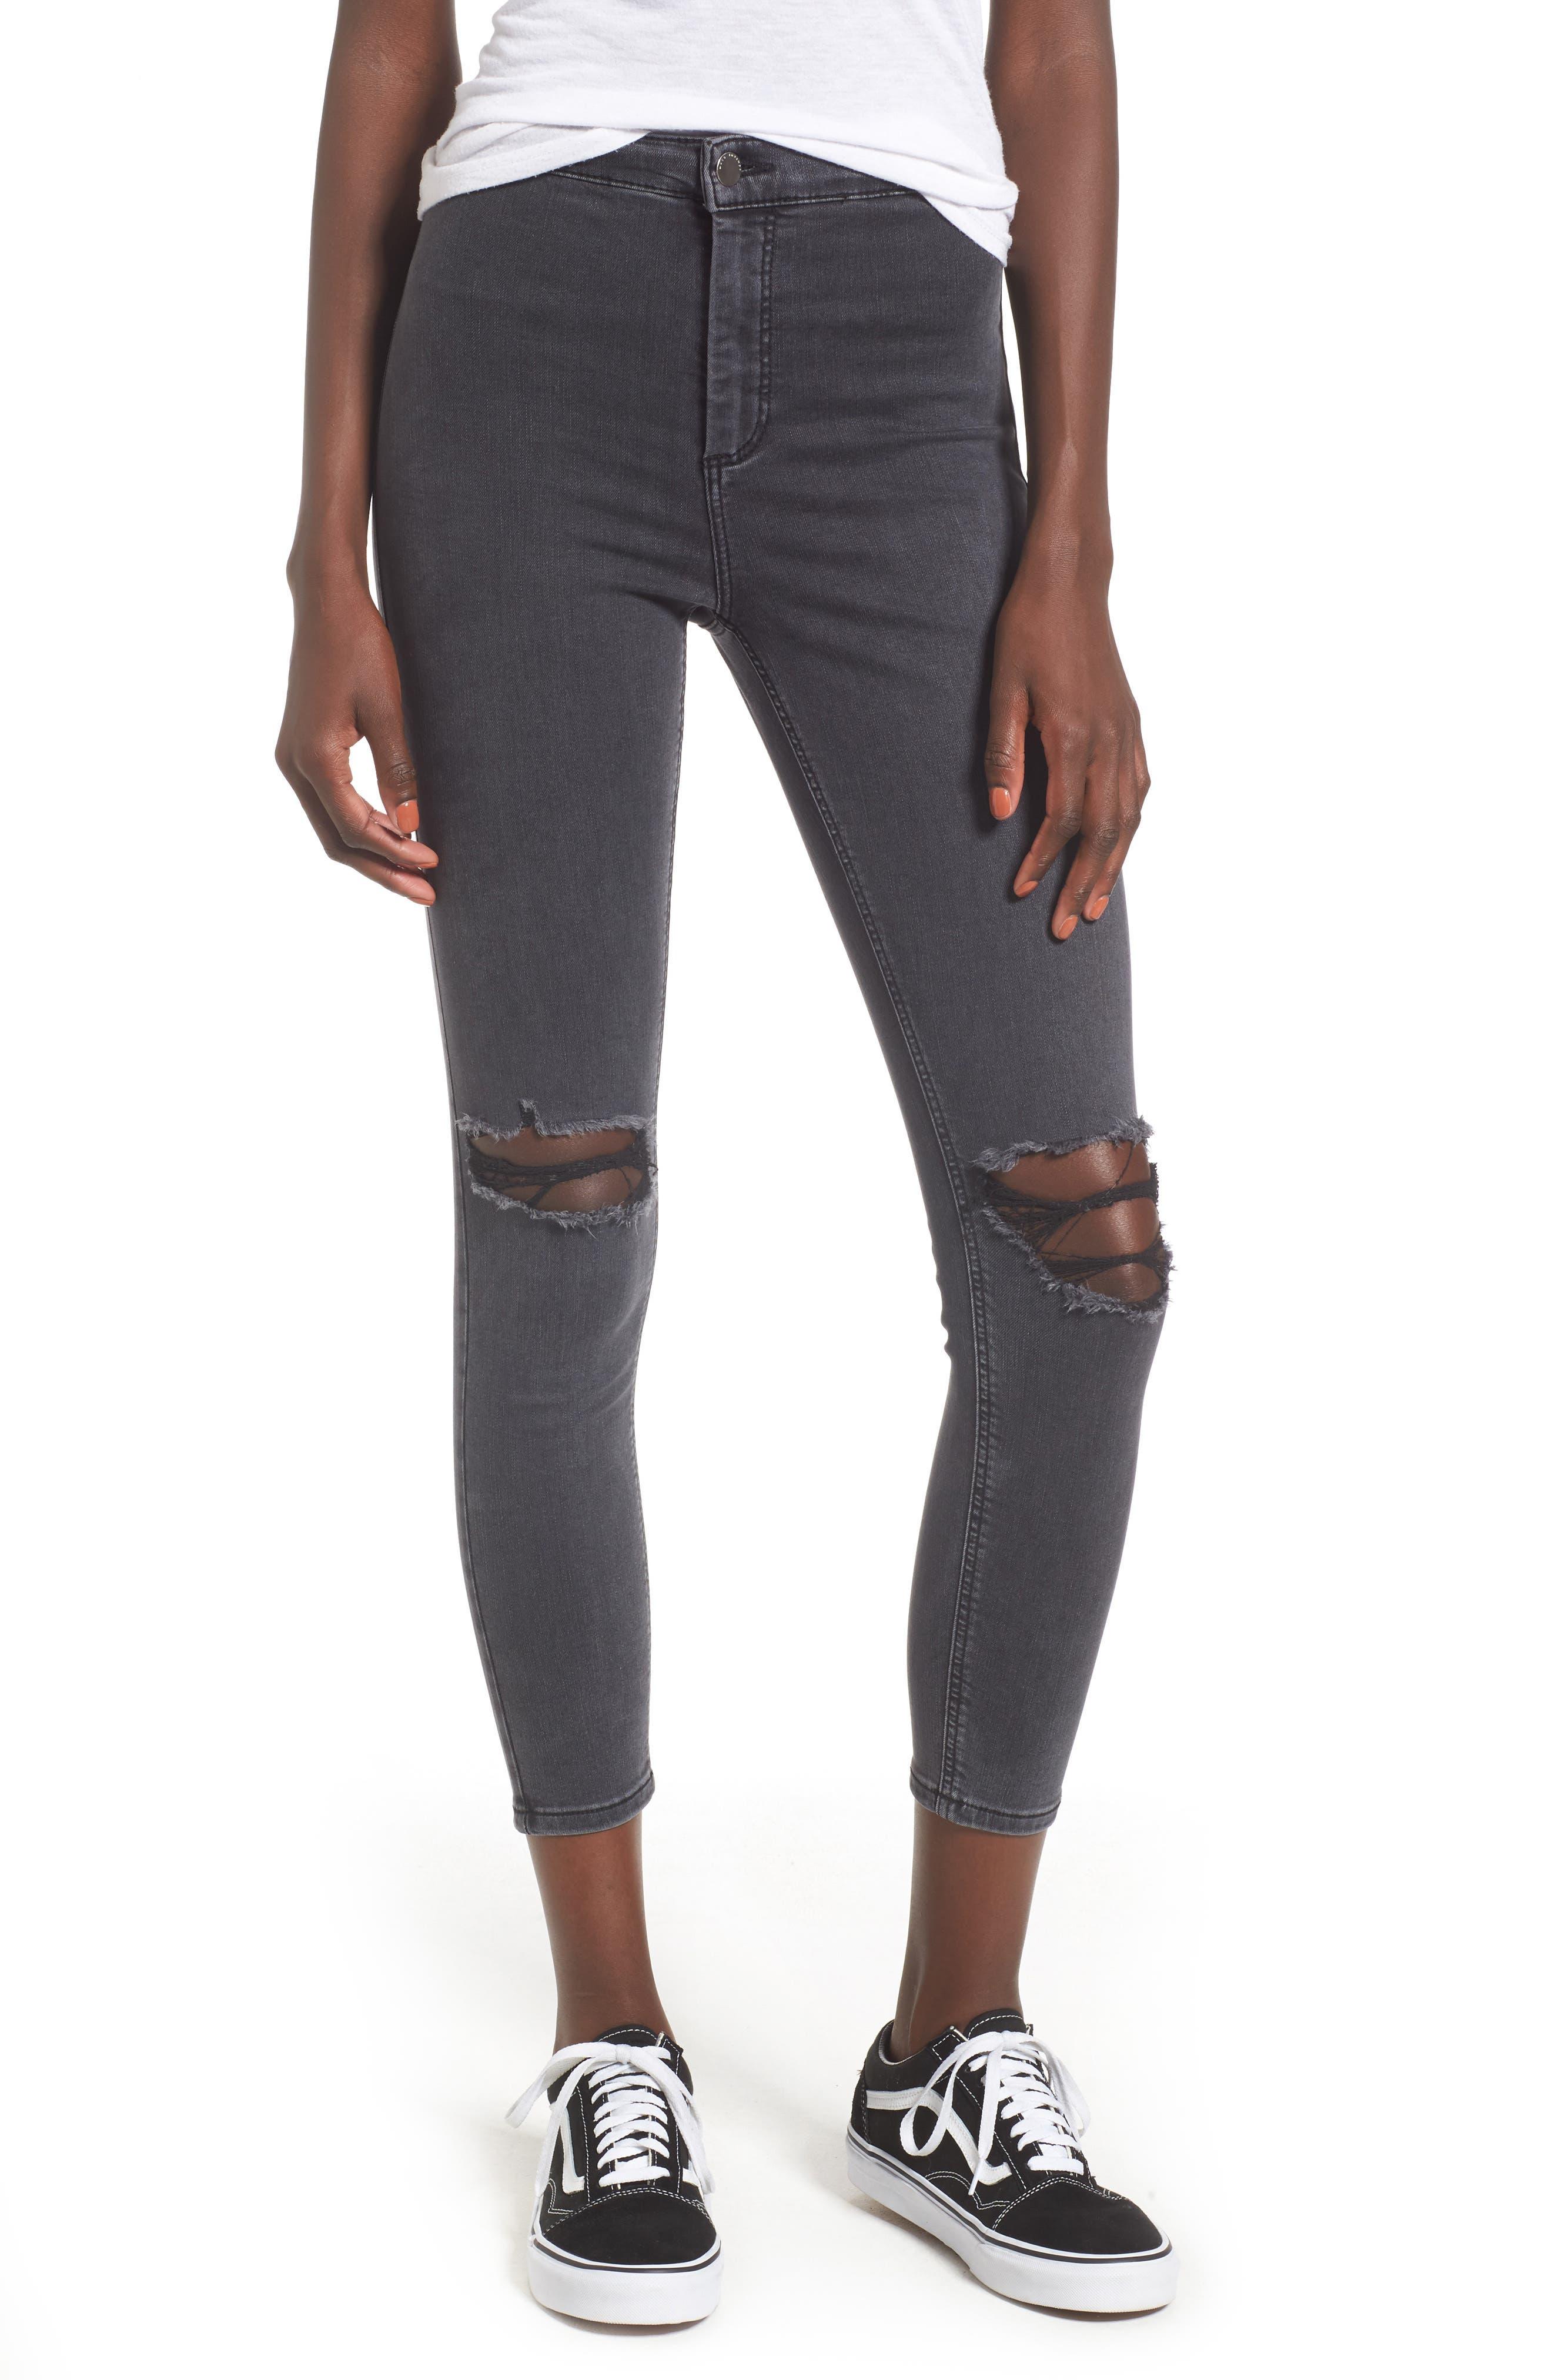 Topshop Joni Ripped Crop Skinny Jeans